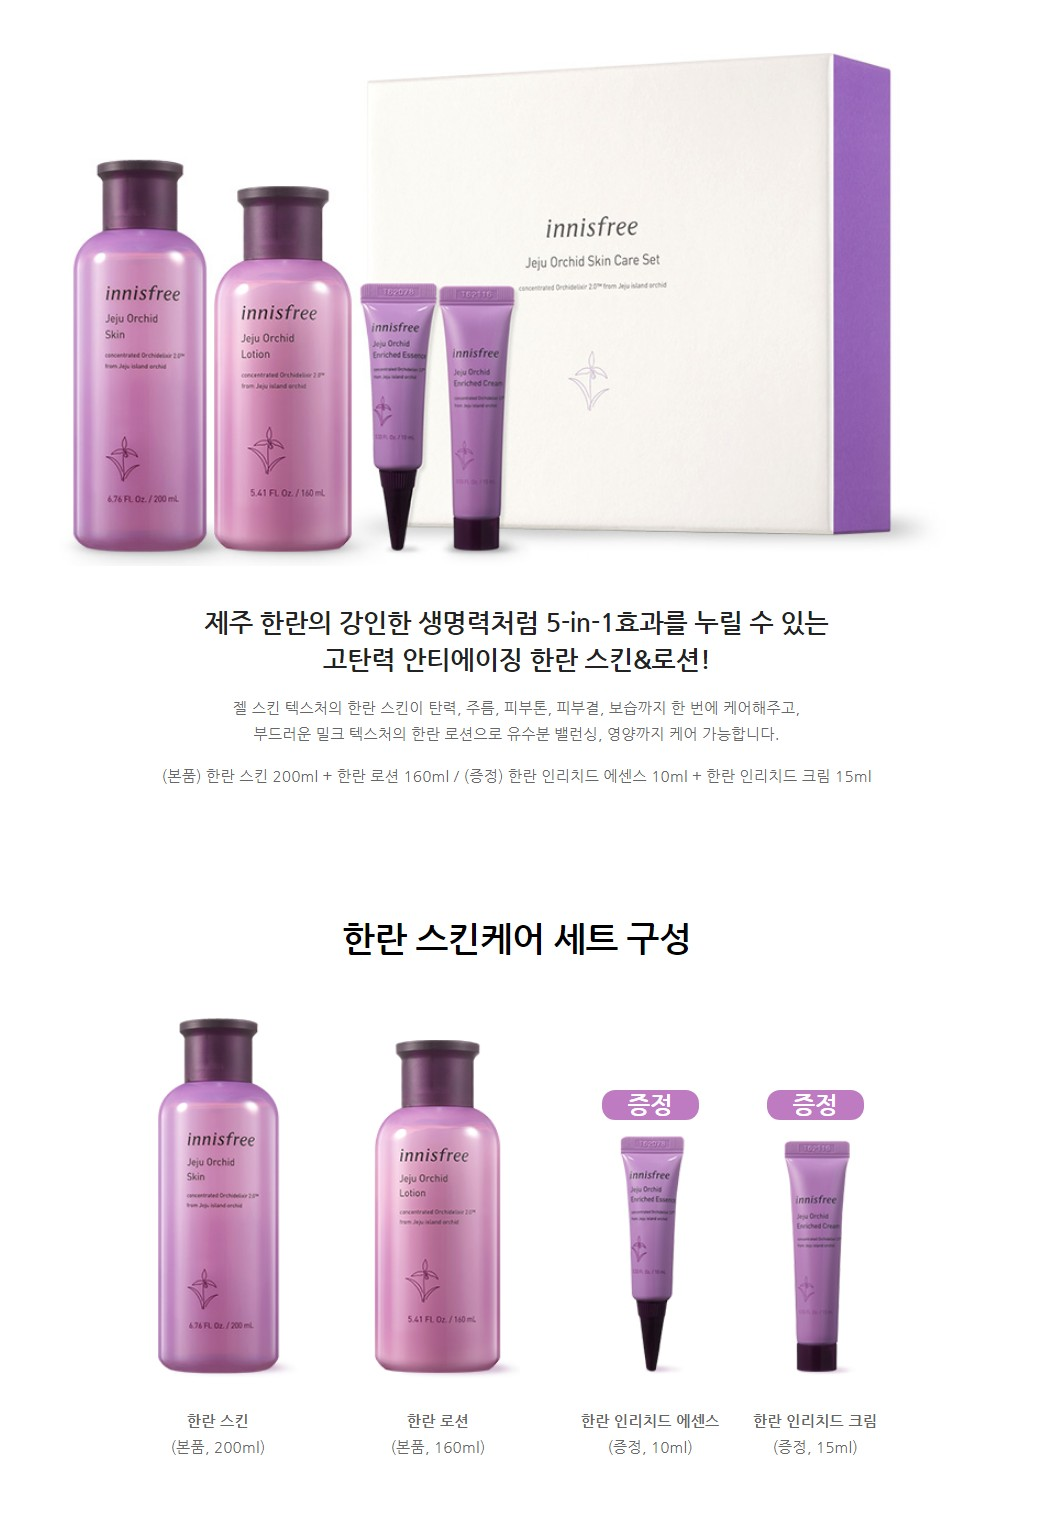 Innisfree Jeju Orchid Skin Care Set